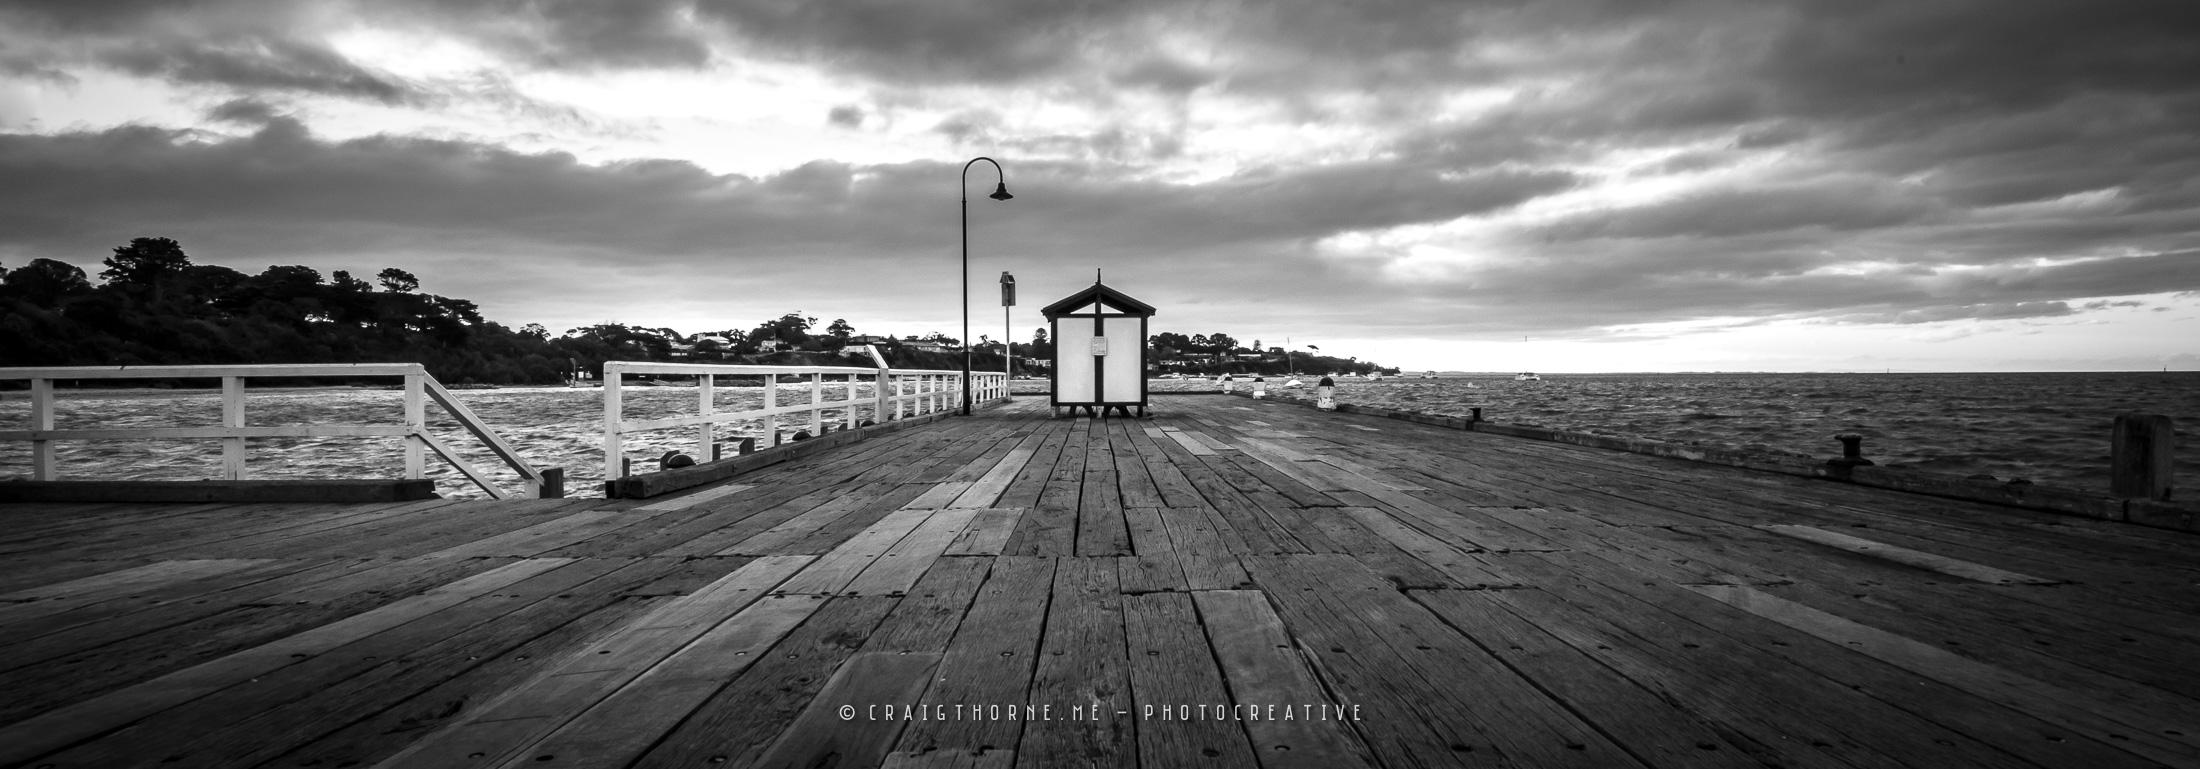 20180706-85-Panoramas-by-Craig-Thorne-THN_8575.jpg